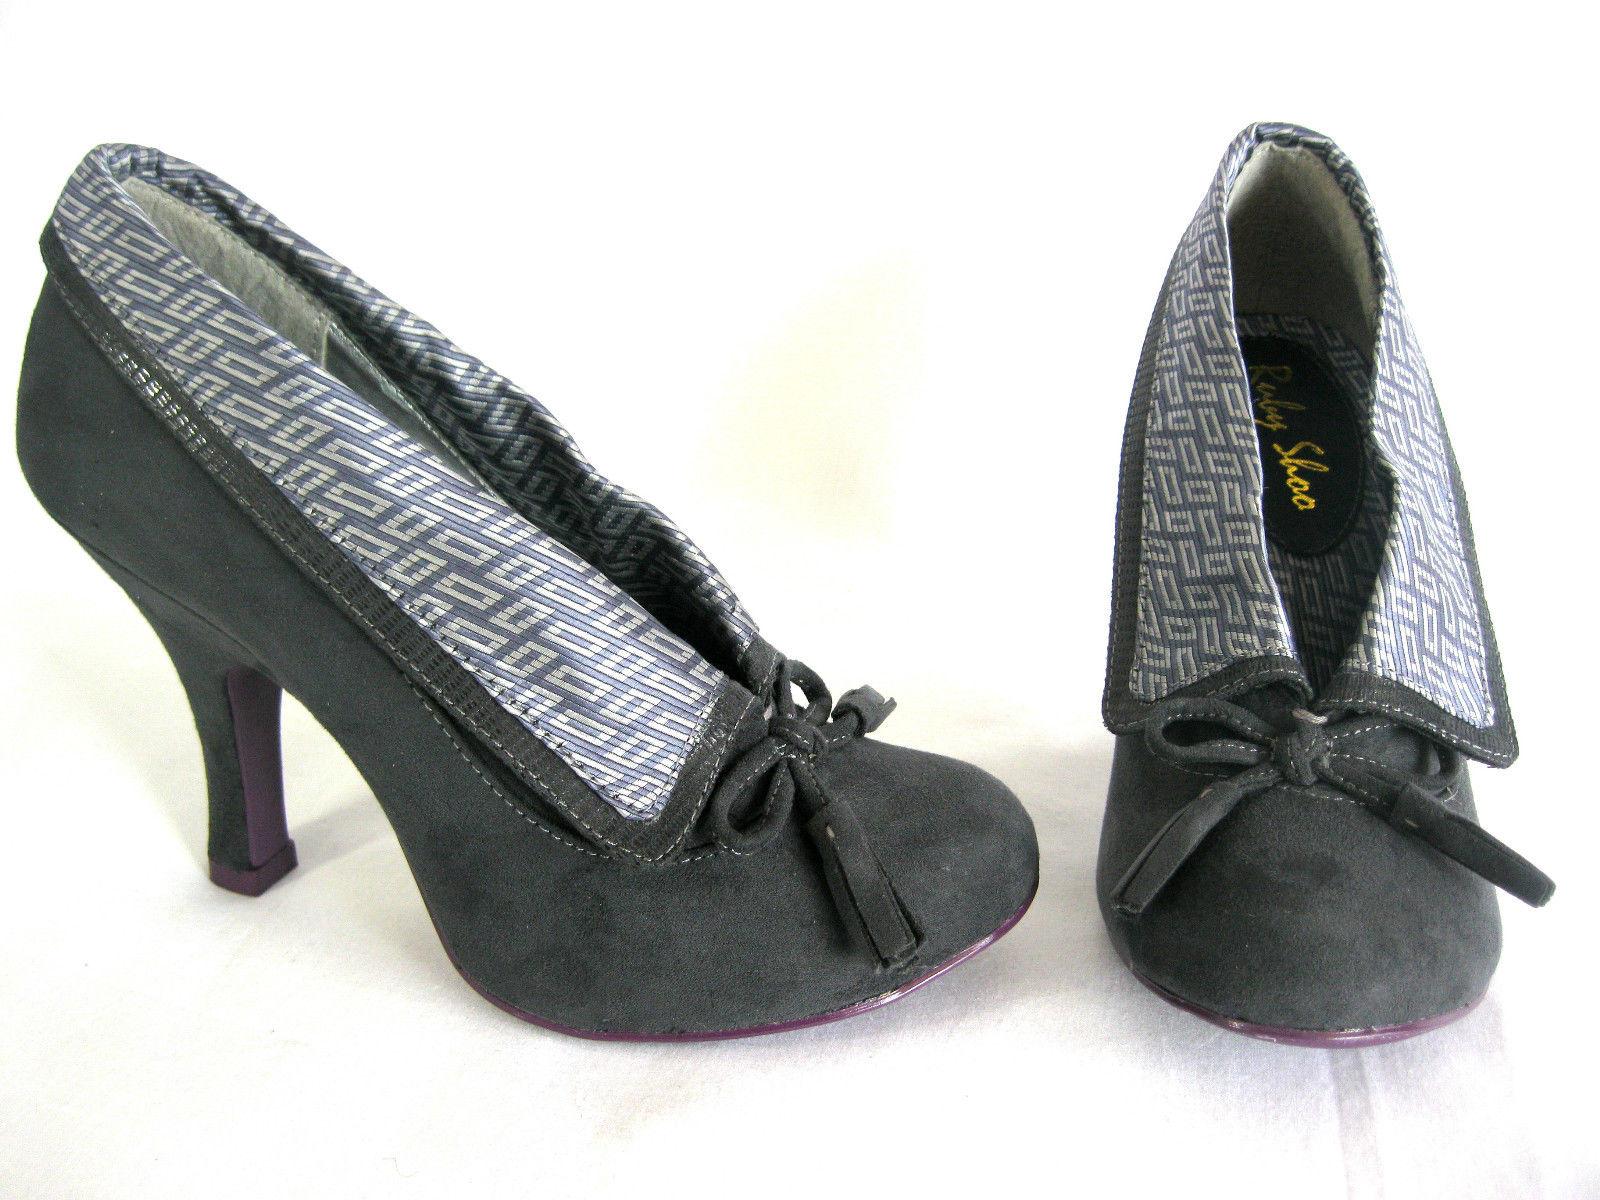 Ruby Shoo Sz 3-8 grau Demi schuhe schuhe schuhe schuhe Stiefel grau Faux Suede Foldover Tops & Bows bd3c14